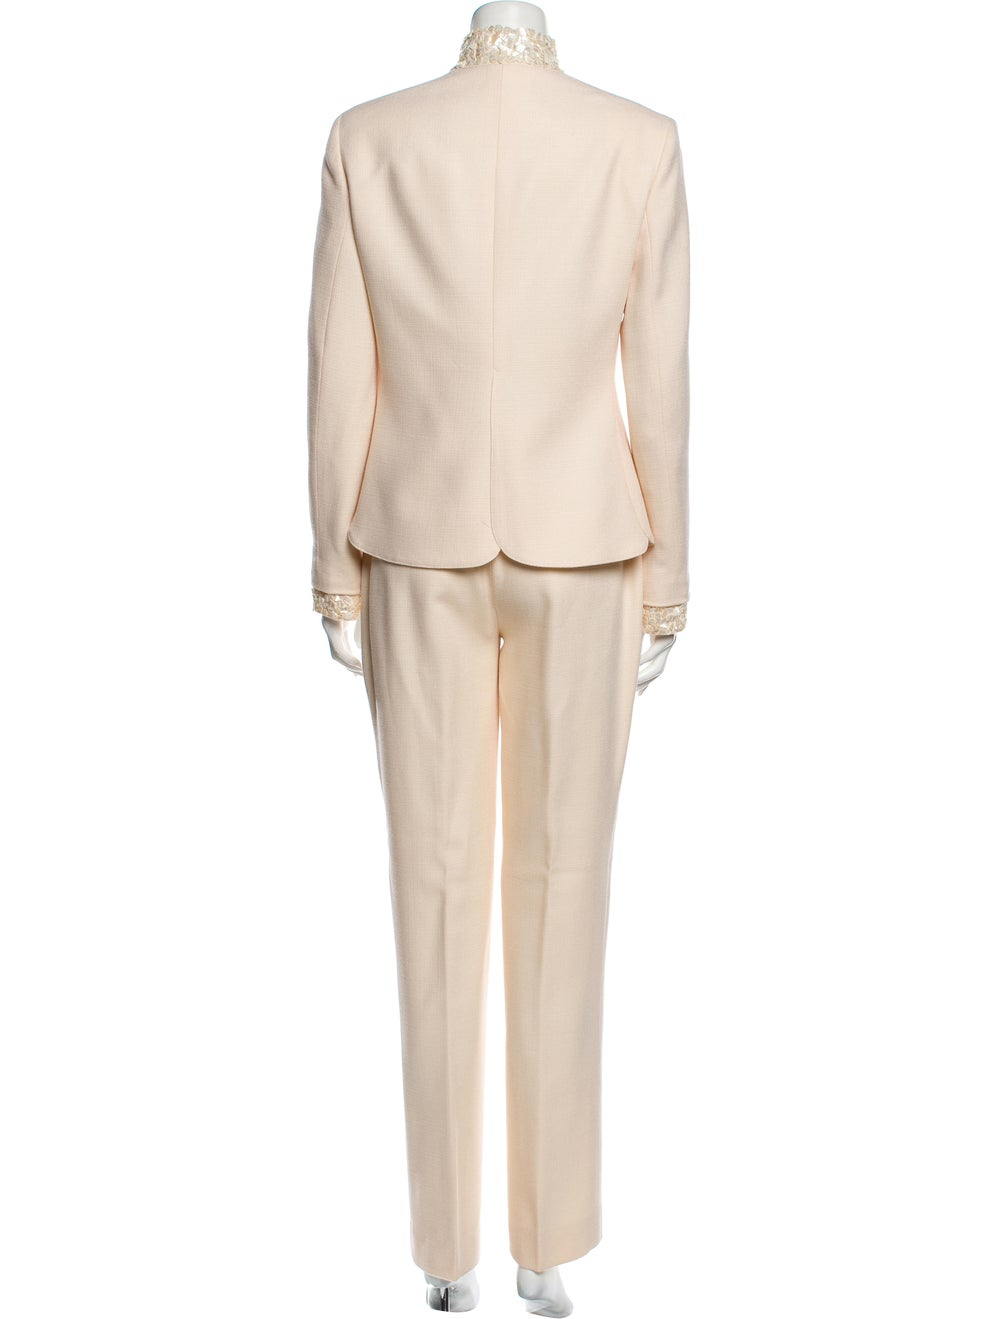 Gianni Versace Vintage 1990's Pantsuit - image 3